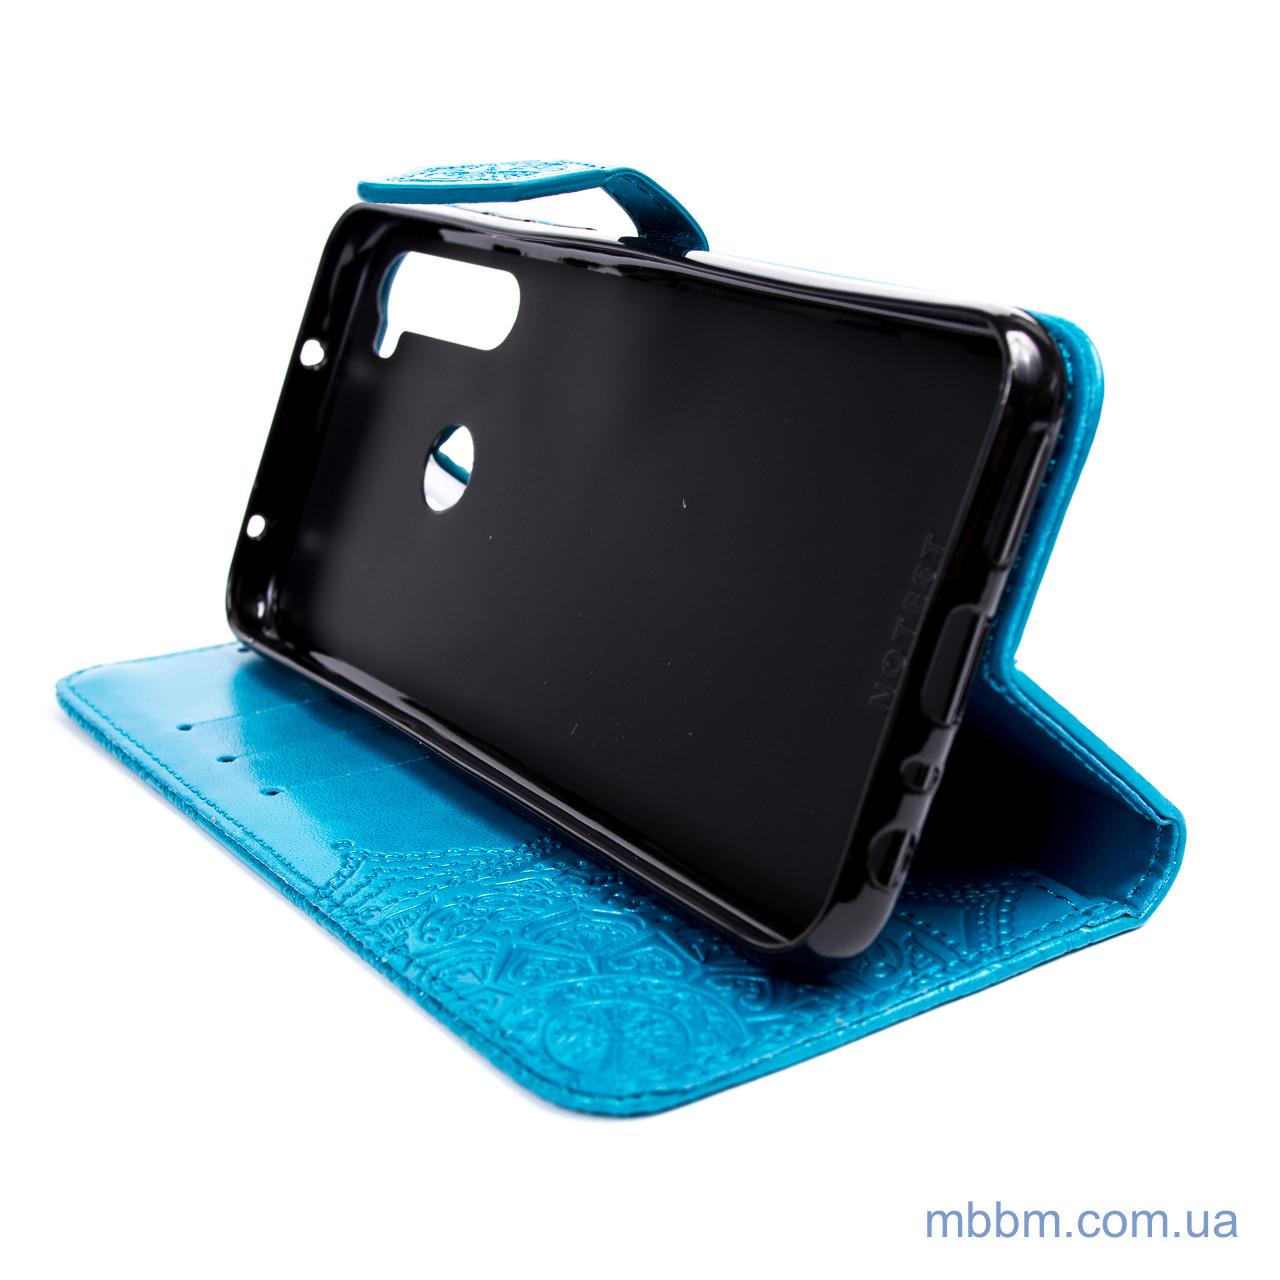 Чехлы для Xiaomi Redmi Note 8T Art Case с визитницей 8t Blue